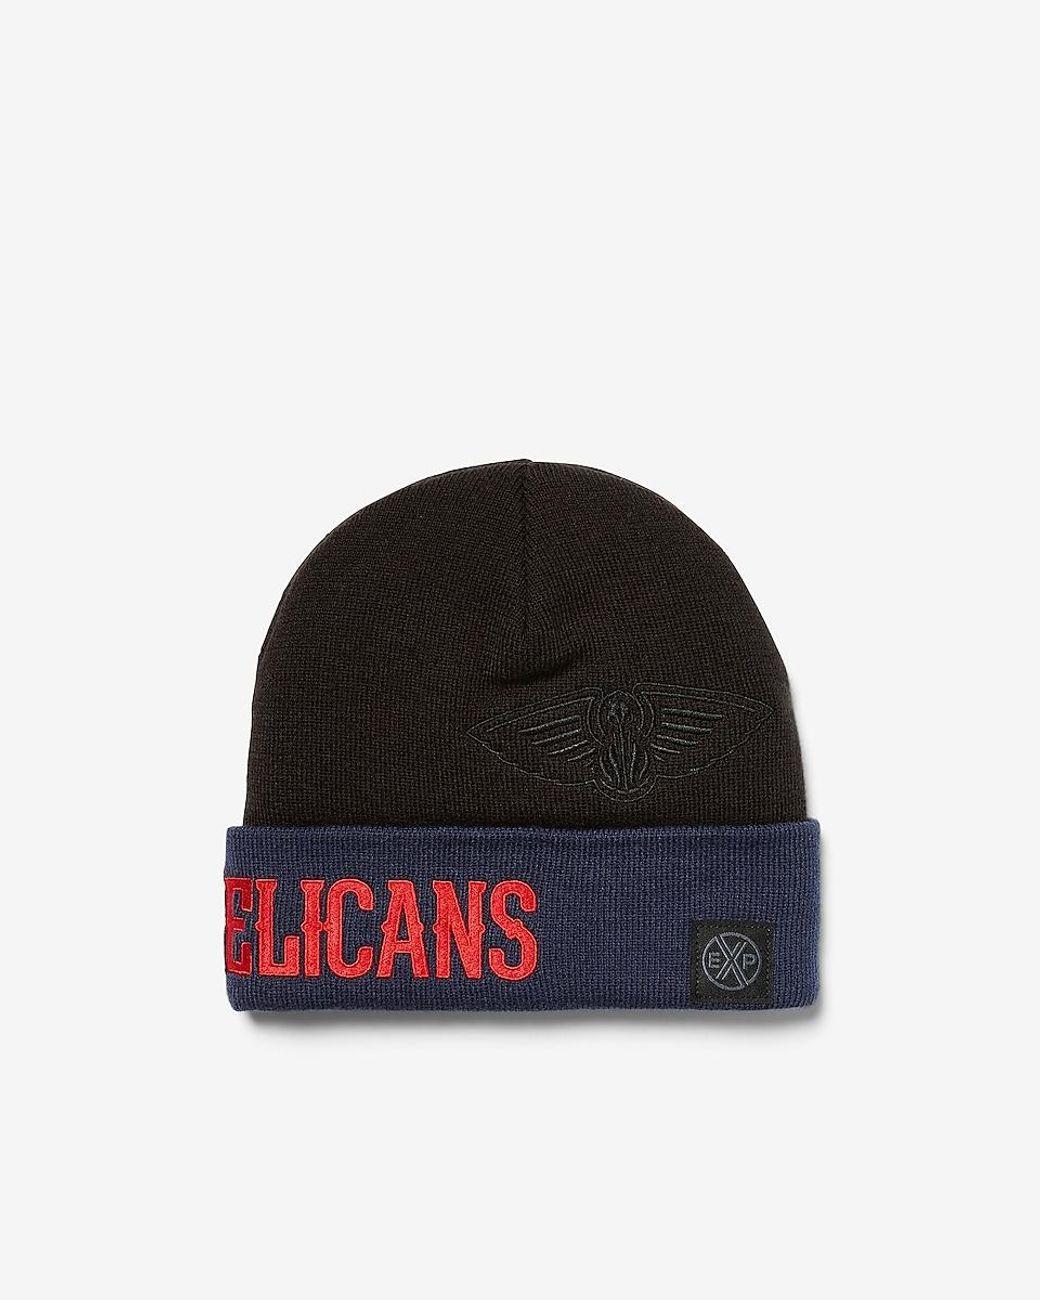 Men S New Orleans Pelicans Nba Beanie Black